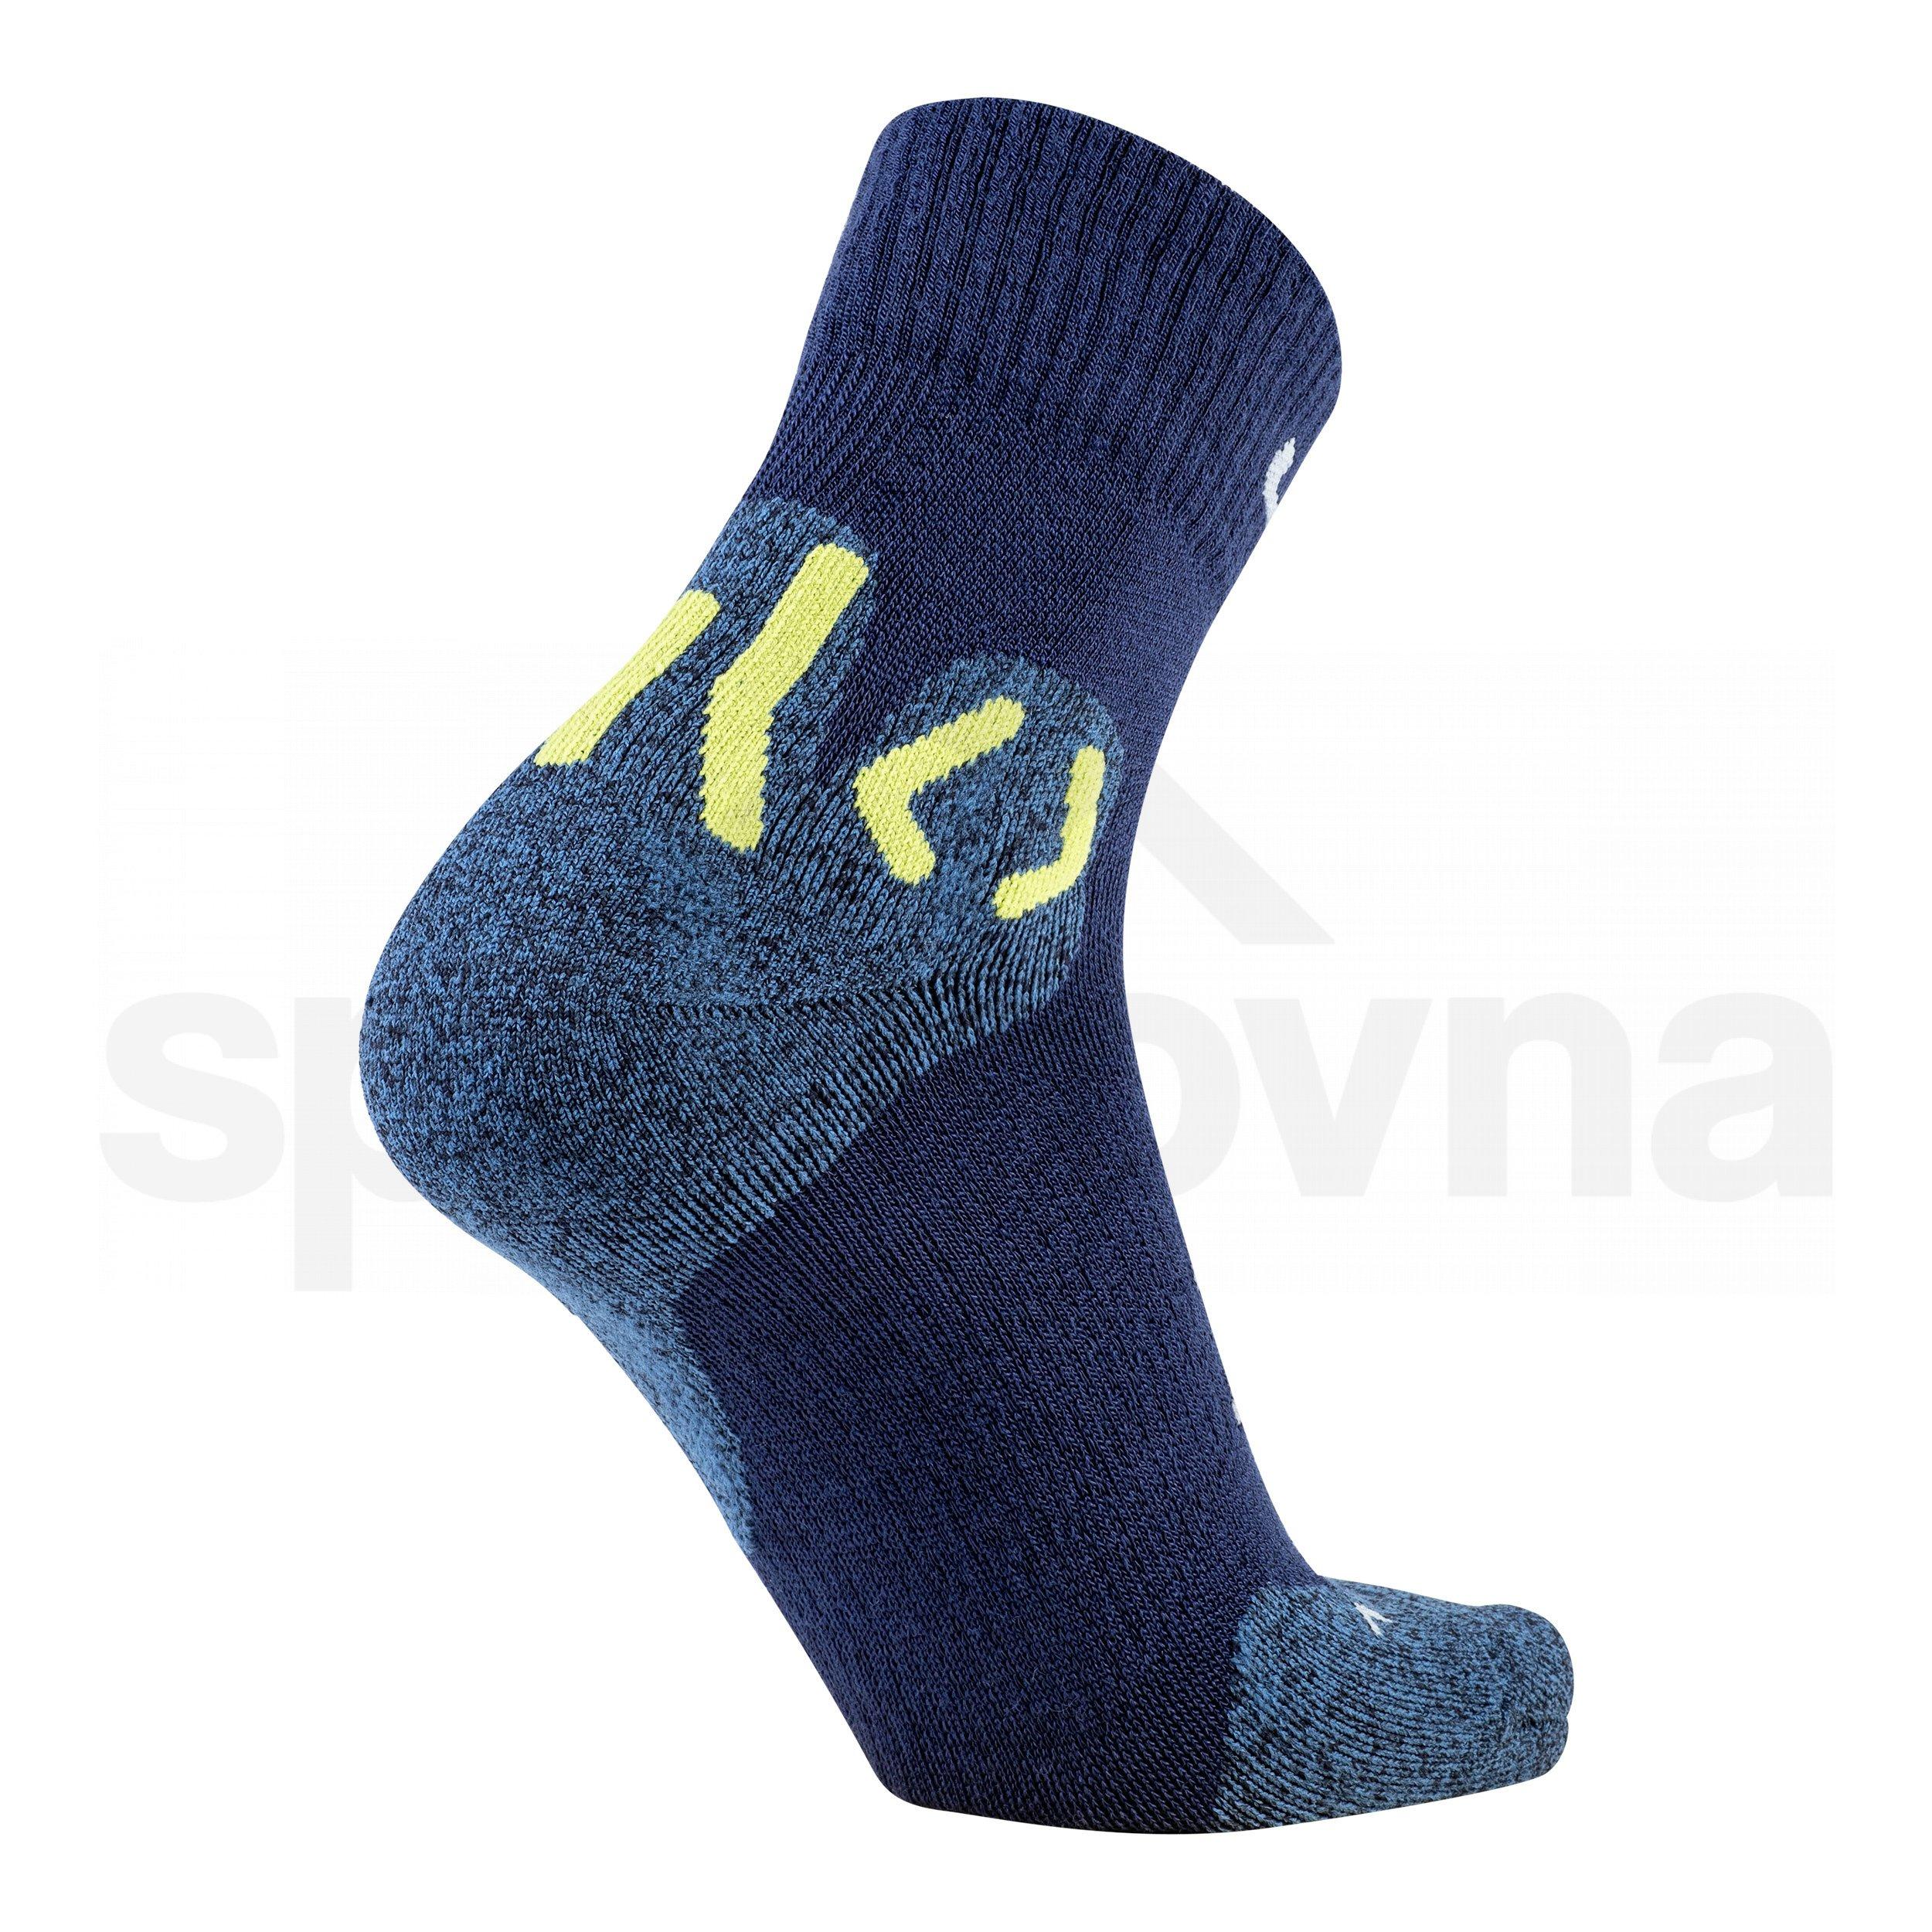 Pánské ponožky UYN TREKKING APPROACH MERINO MID SOCKS - modrá/žlutá